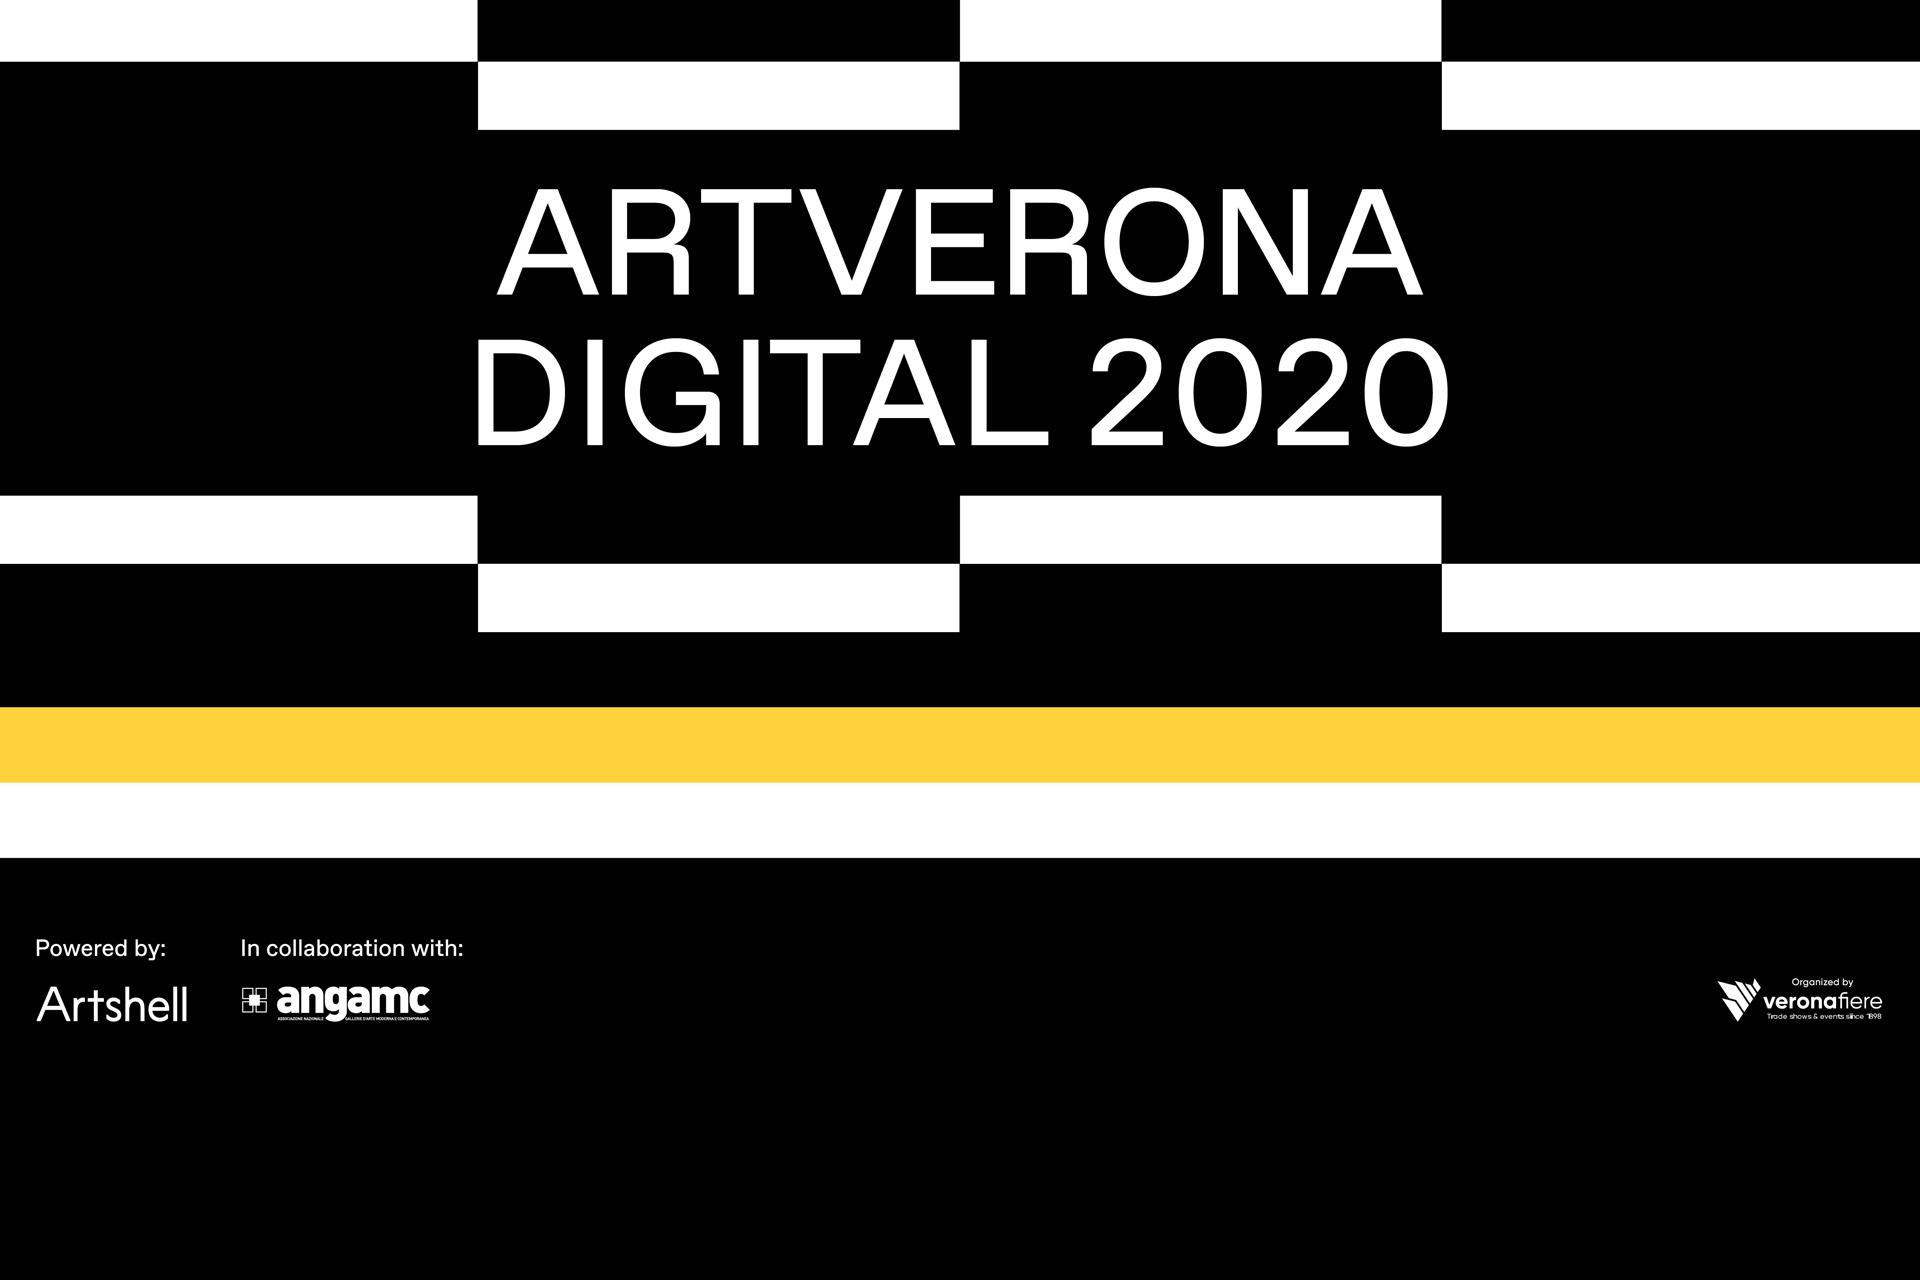 ARTVERONA RIPARTE DAL DIGITAL, INSIEME AD ANGAMC